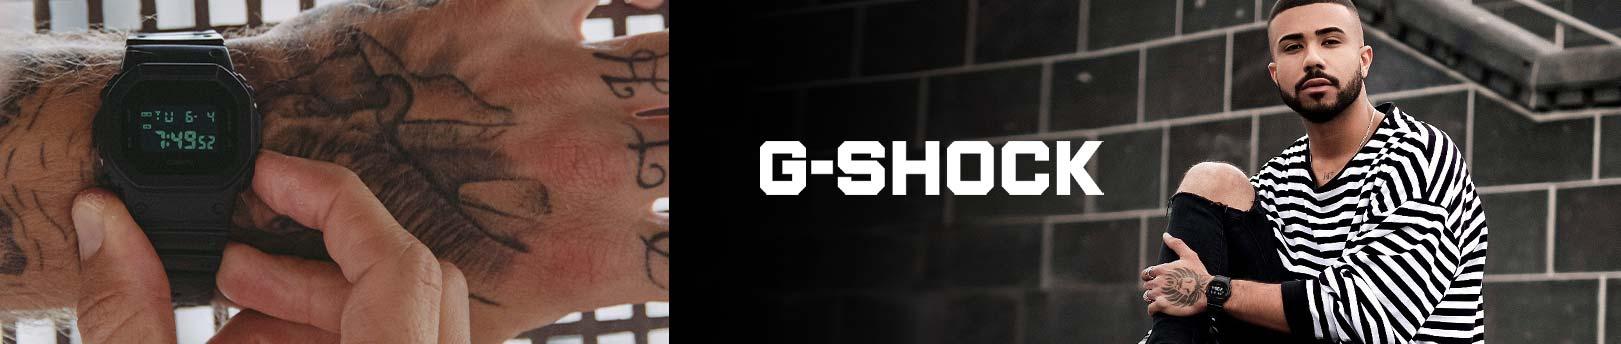 Scopri G-shock